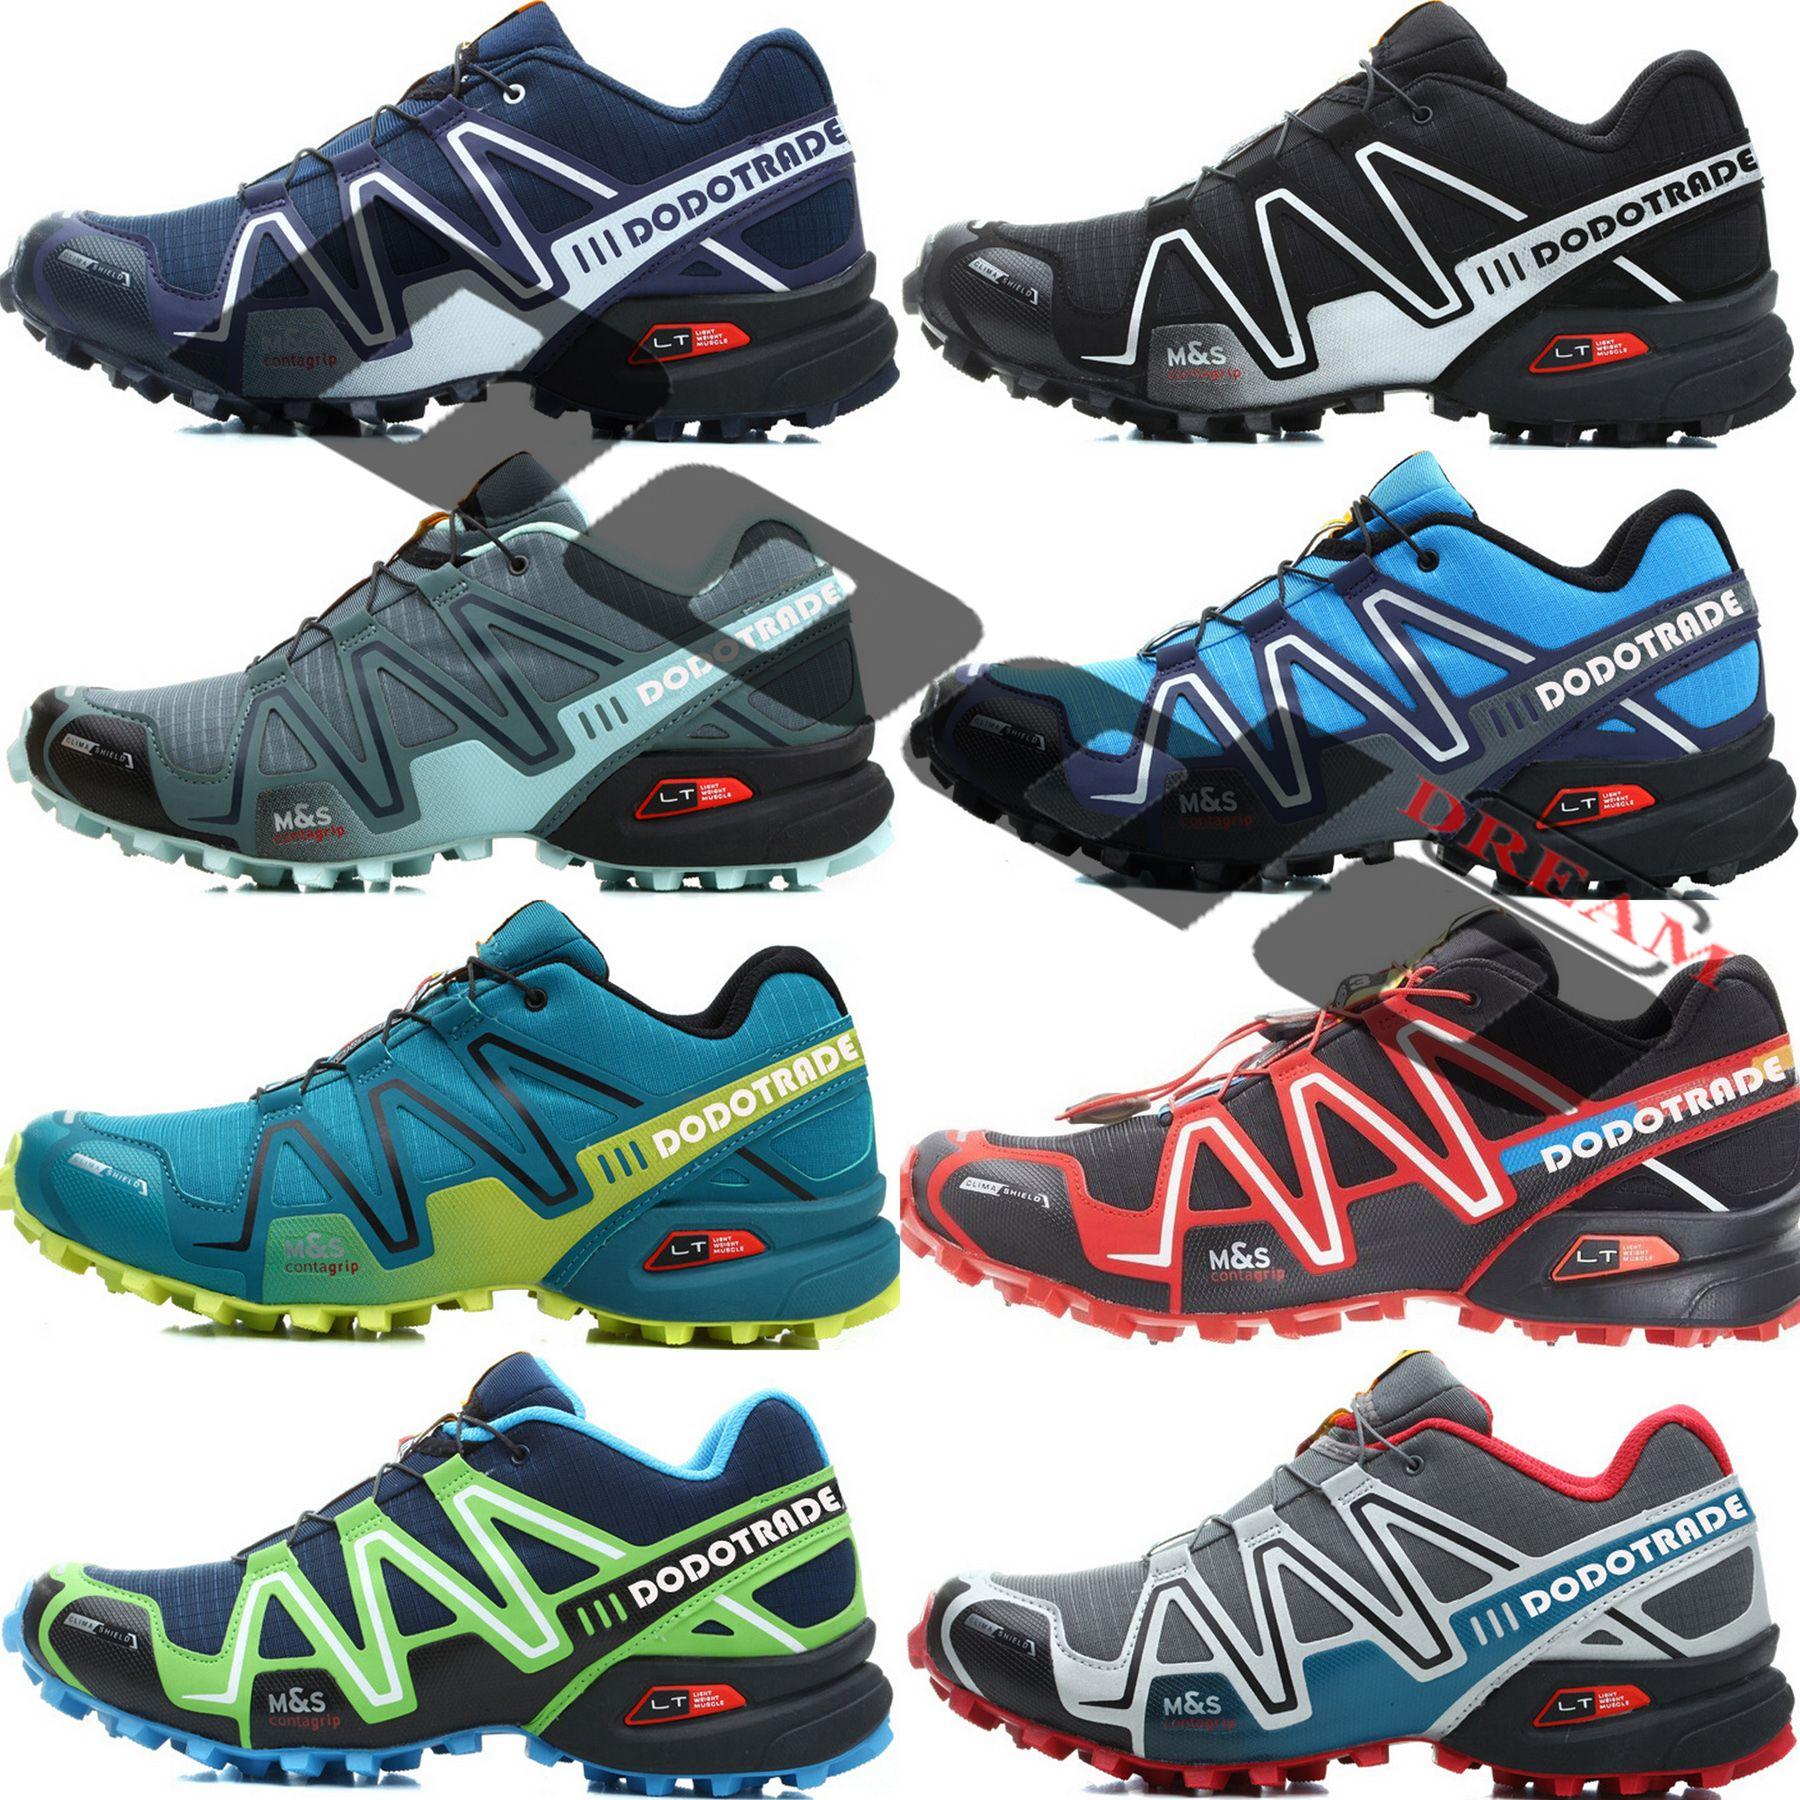 Compre Epacket Homens Velocidade Cross Running Shoes Cross Country 3  Sapatilhas Homens Barato Sport Shoes Y3factory Adultos Esforço Explosivo  Free Run ... 114bf26275